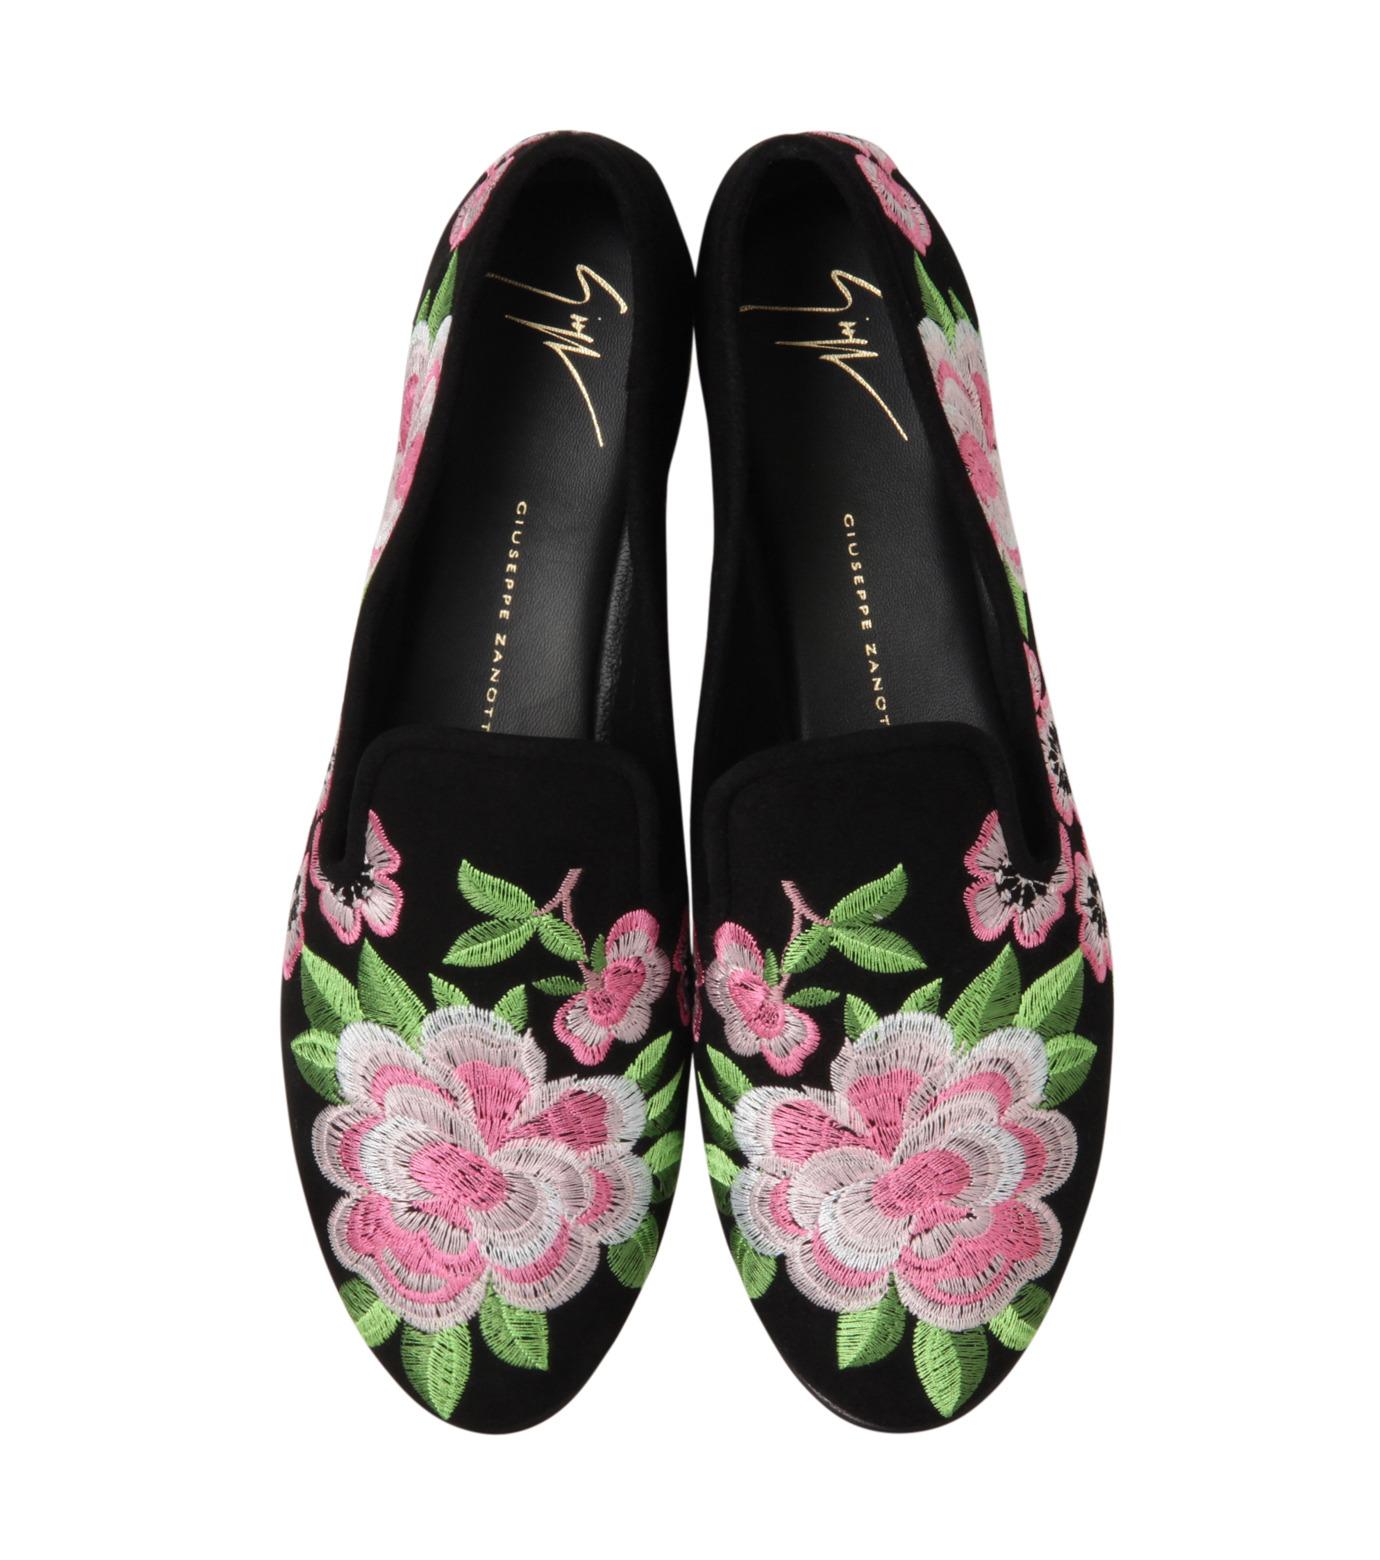 Giuseppe Zanotti Design(ジュゼッペザノッティ)のFlower Embro Opera Shoes-BLACK(シューズ/shoes)-41-6187CA005-13 拡大詳細画像4